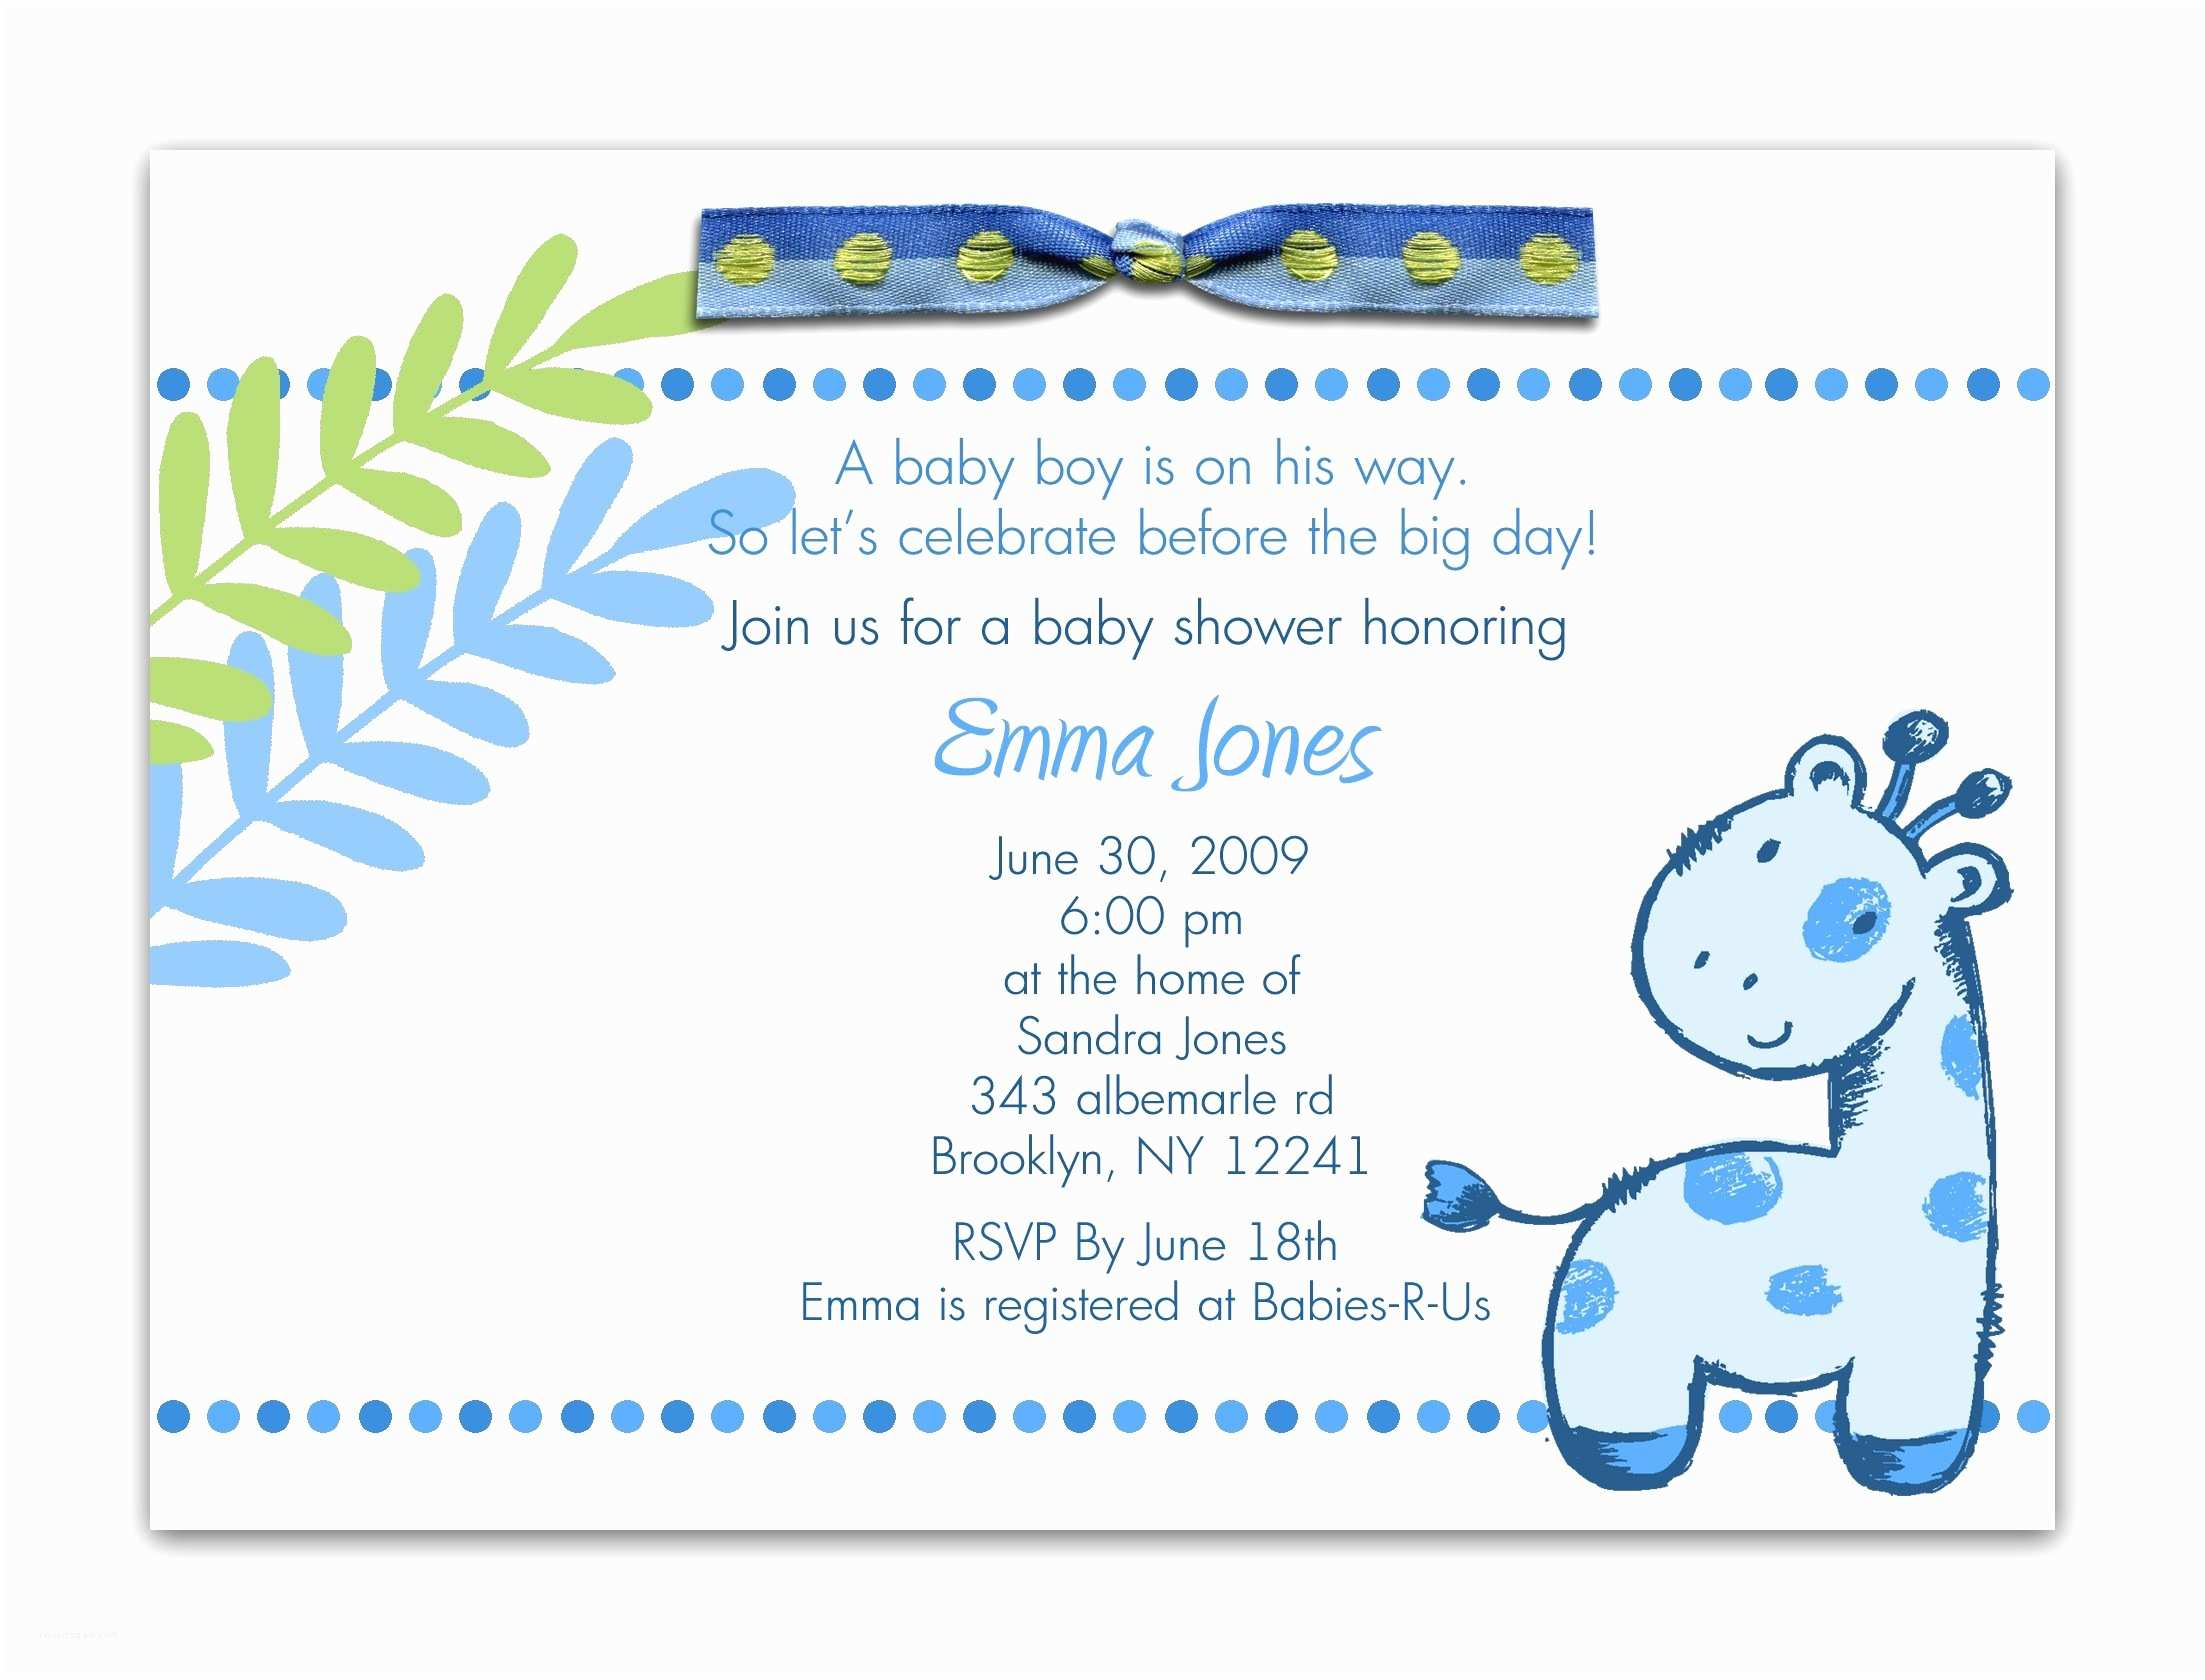 Baby Boy Shower Invitation Wording Invitation for Baby Shower Excellent Baby Boy Shower